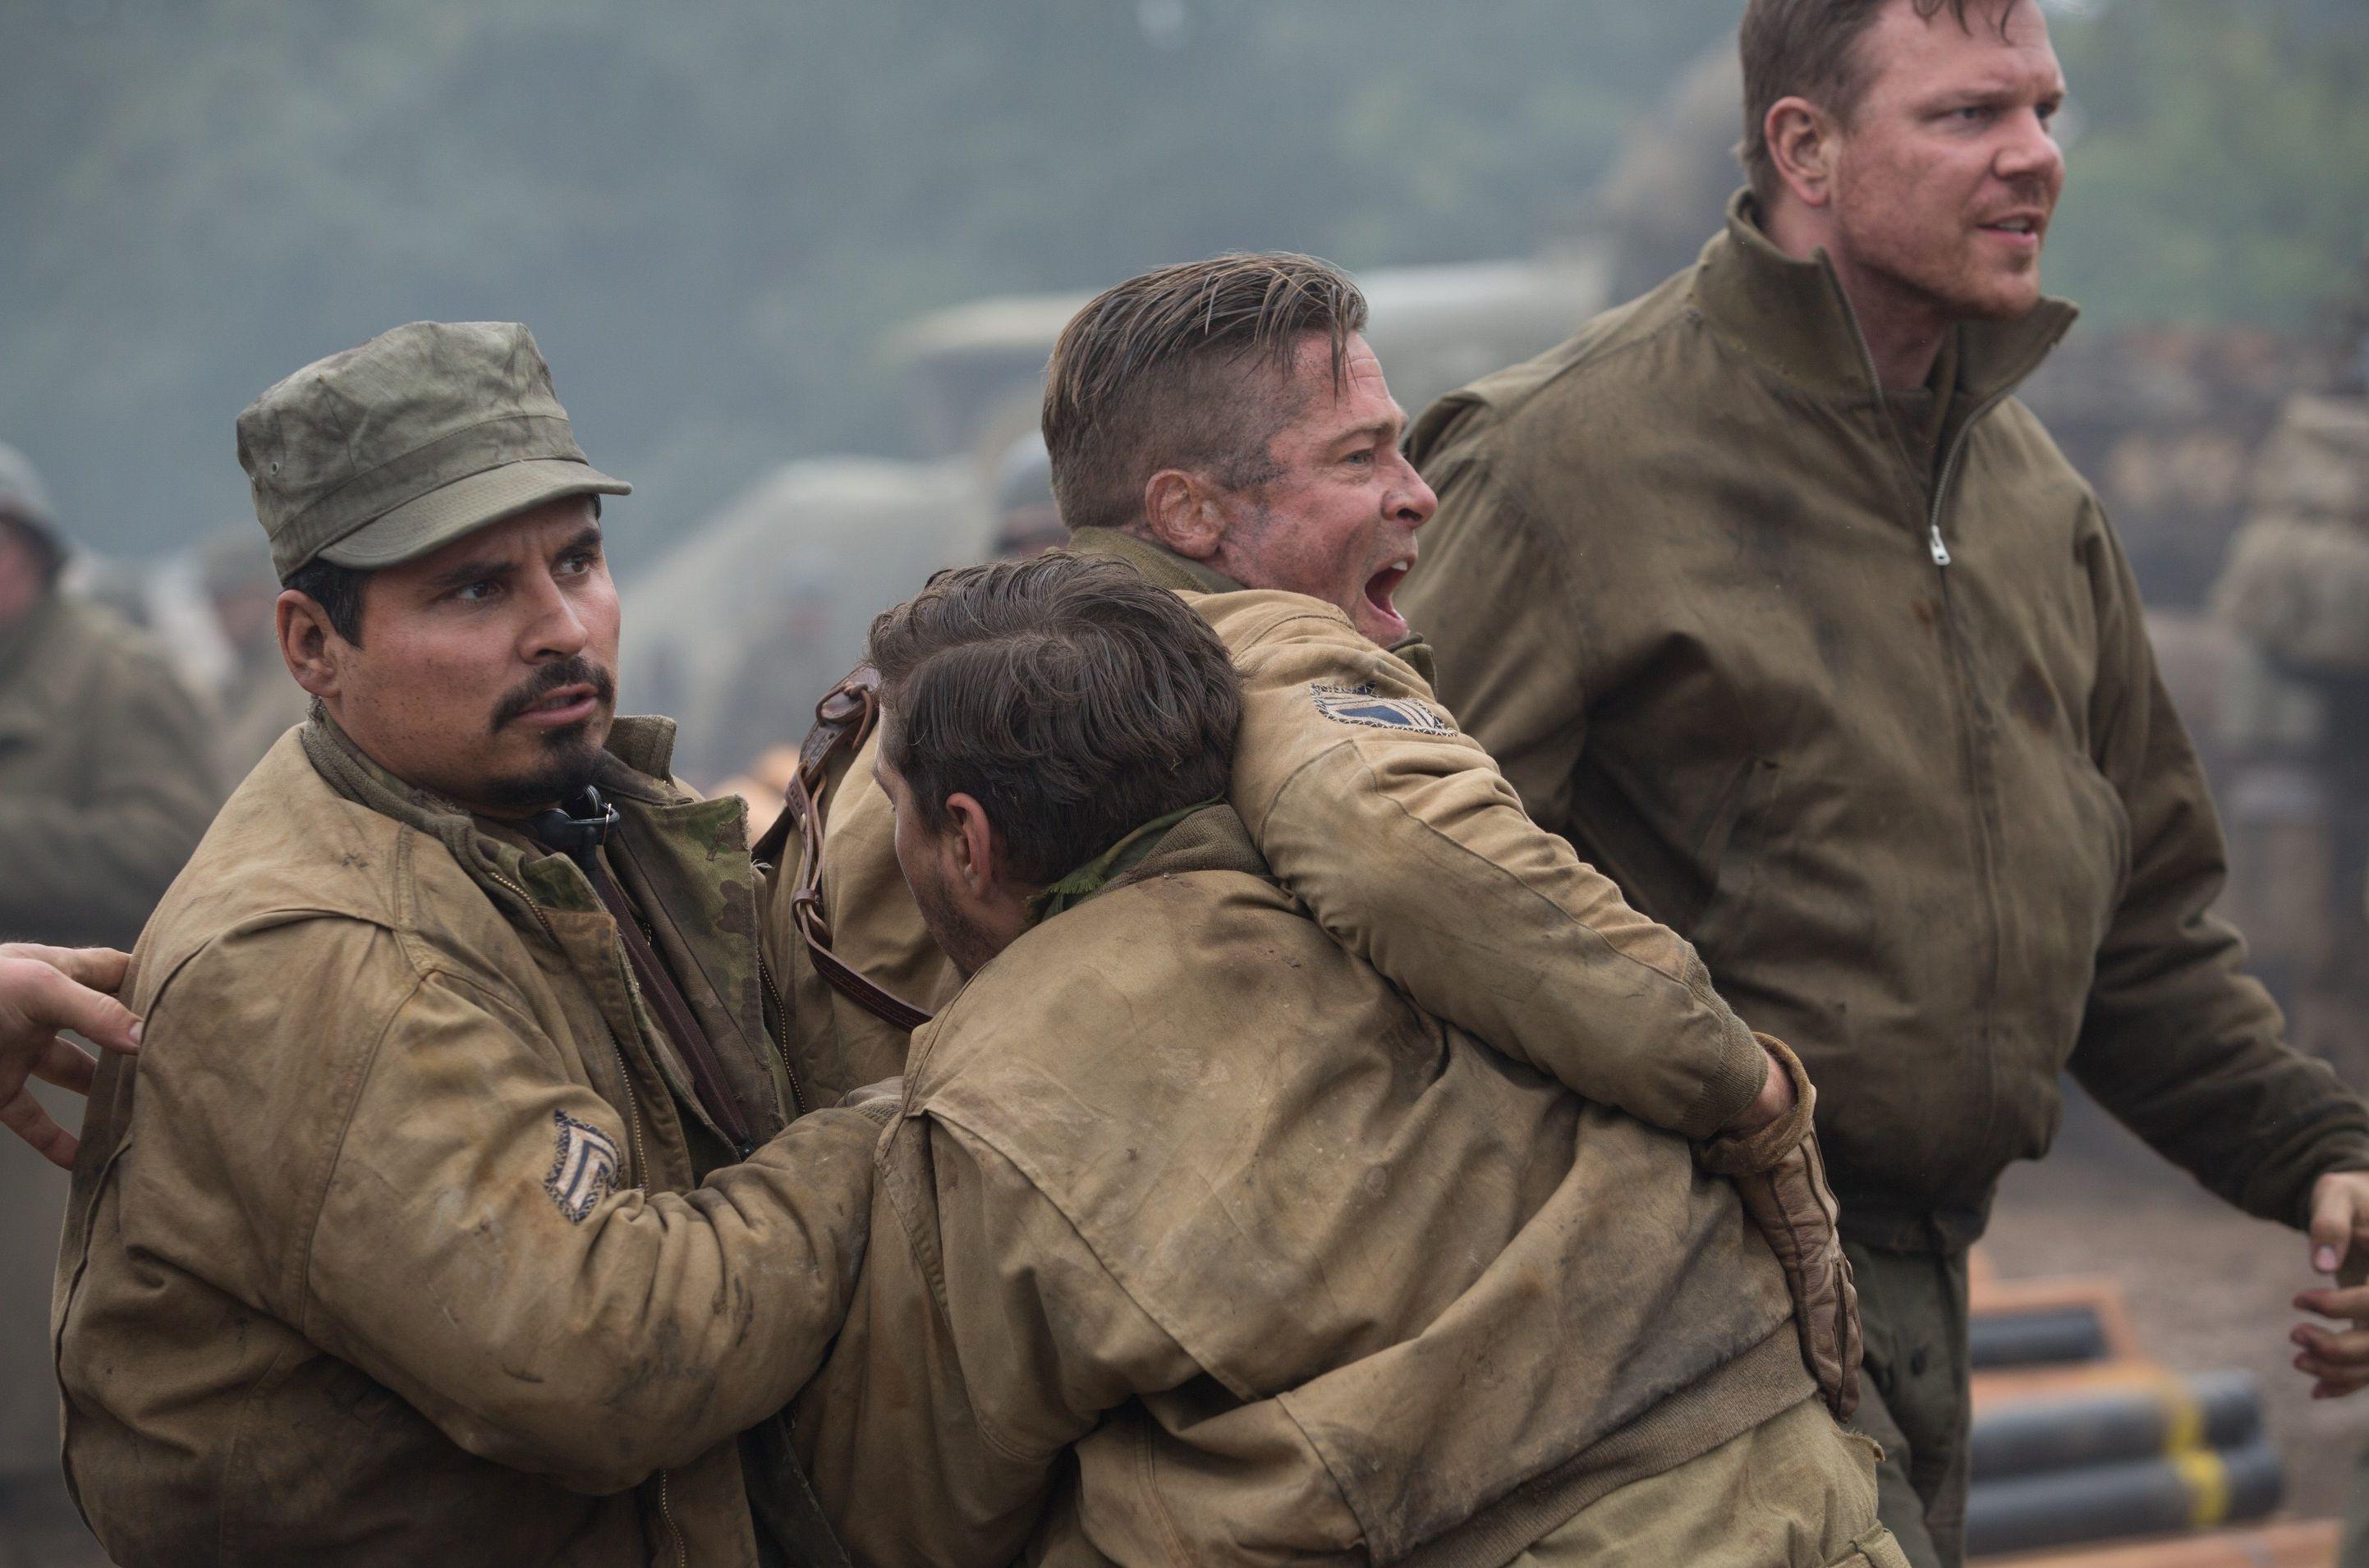 Brad Pitt upset screaming in Fury